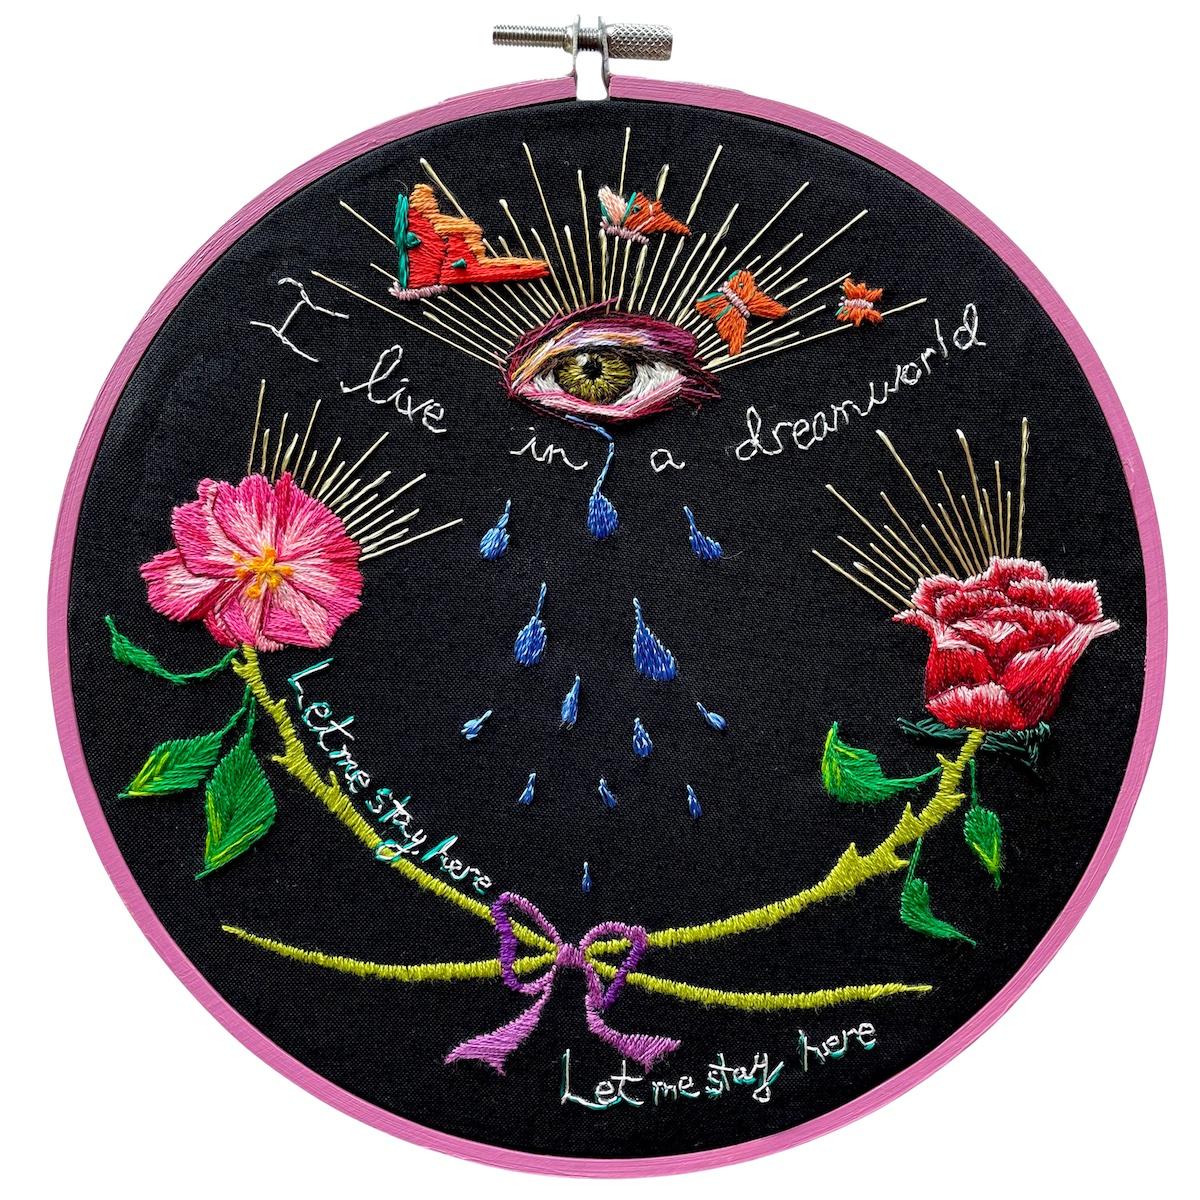 "Amber Mustafic Dreamworld, Noir 2021 Hand embroidery on cotton 8"" diameter"